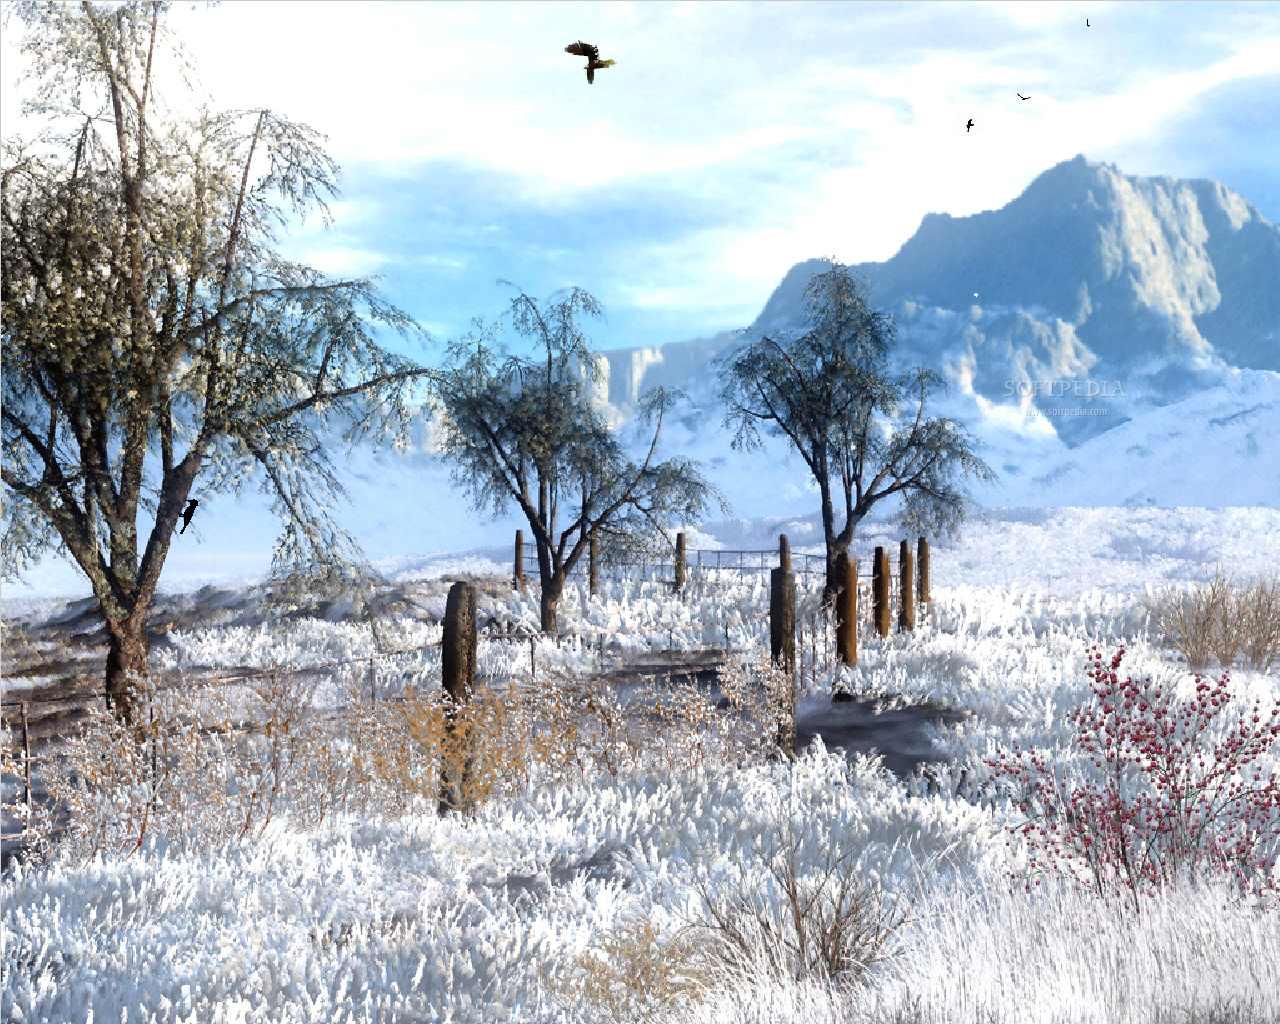 animated winter screen savers 1280x1024